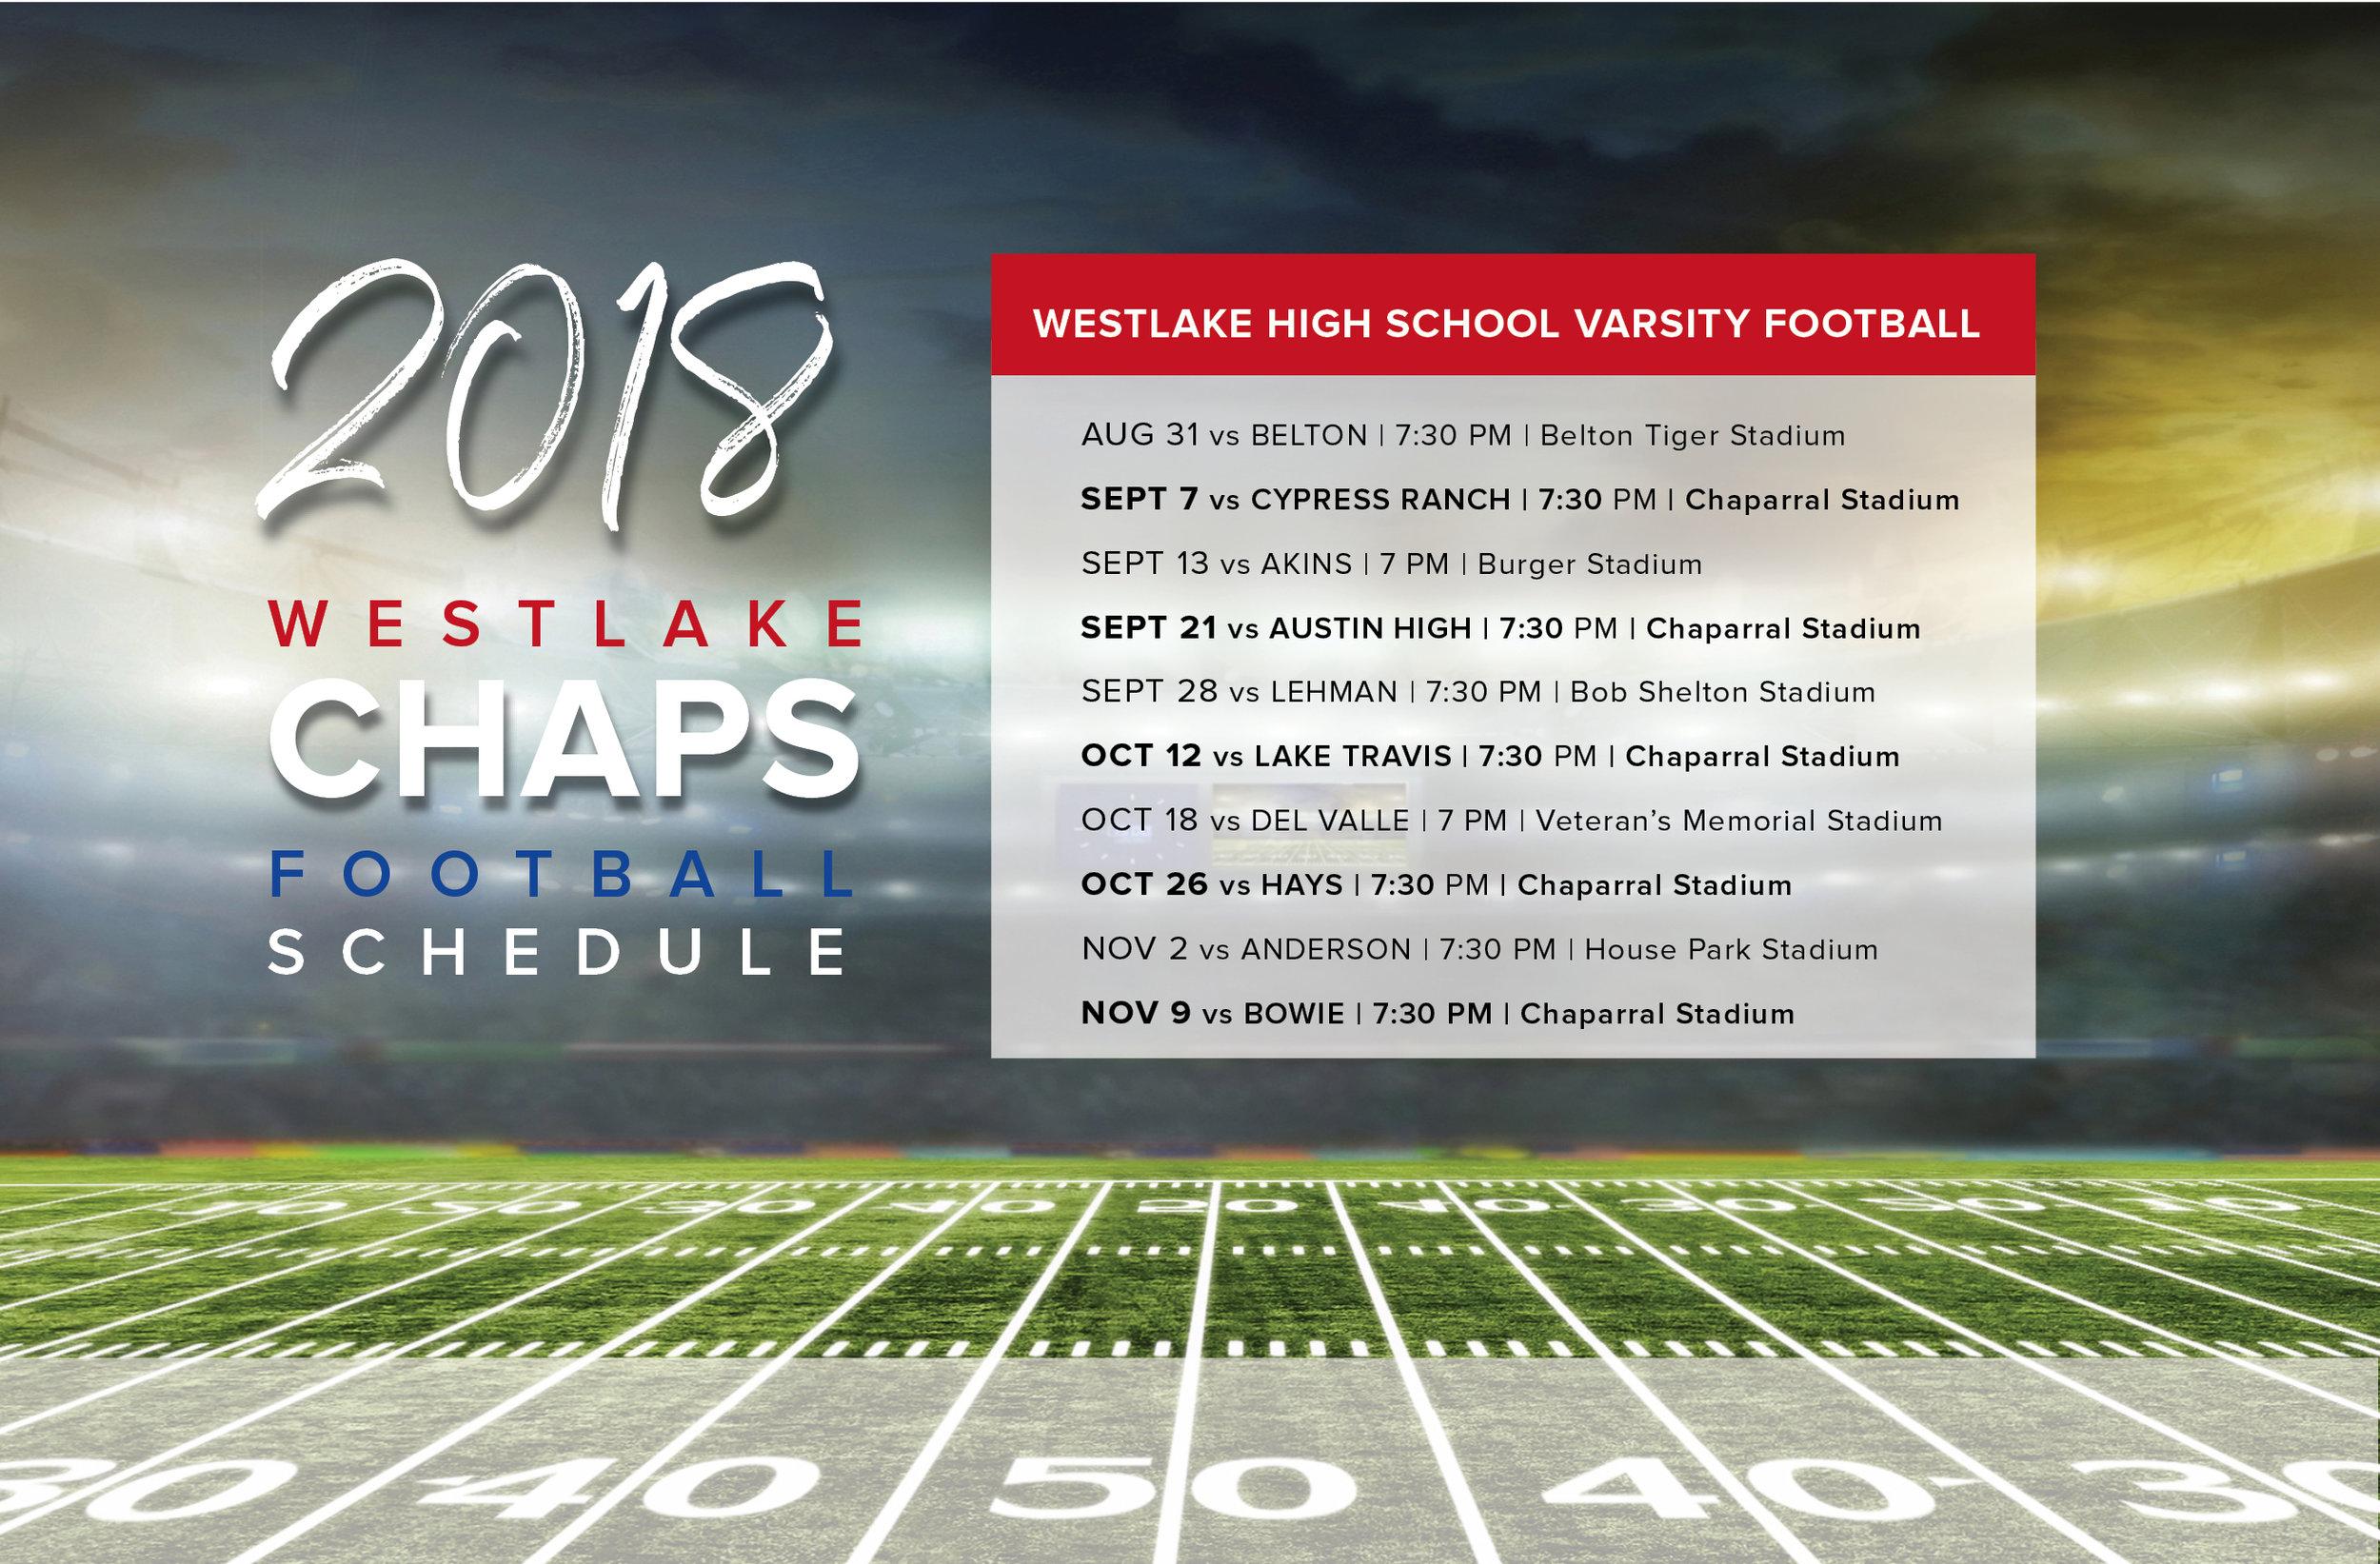 Westlake High School Football Schedule Fall 2018